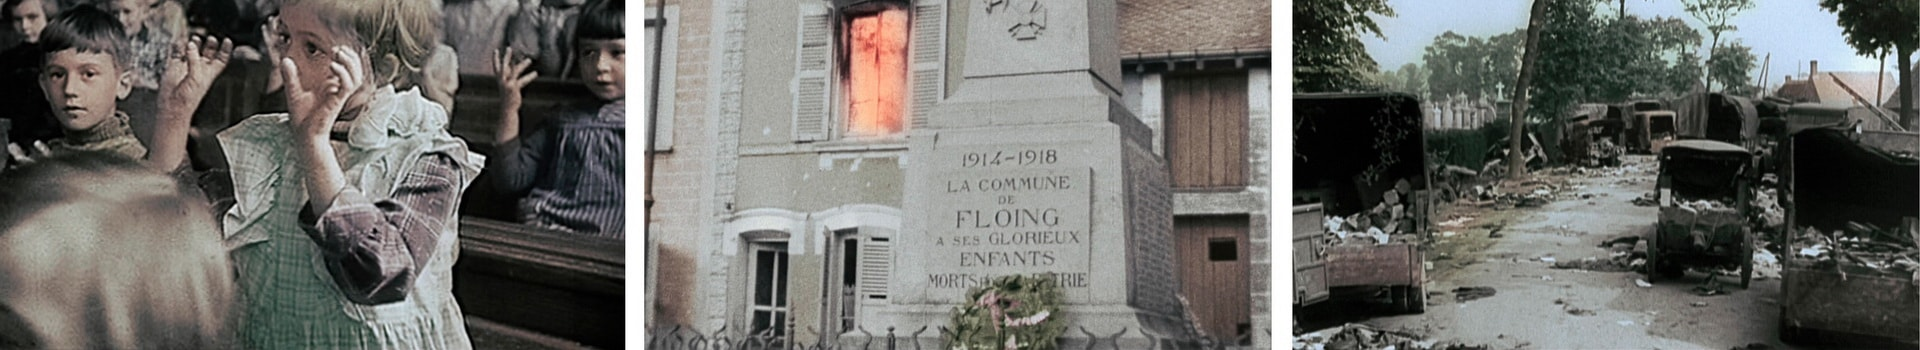 Победа Германии на Францией 1940